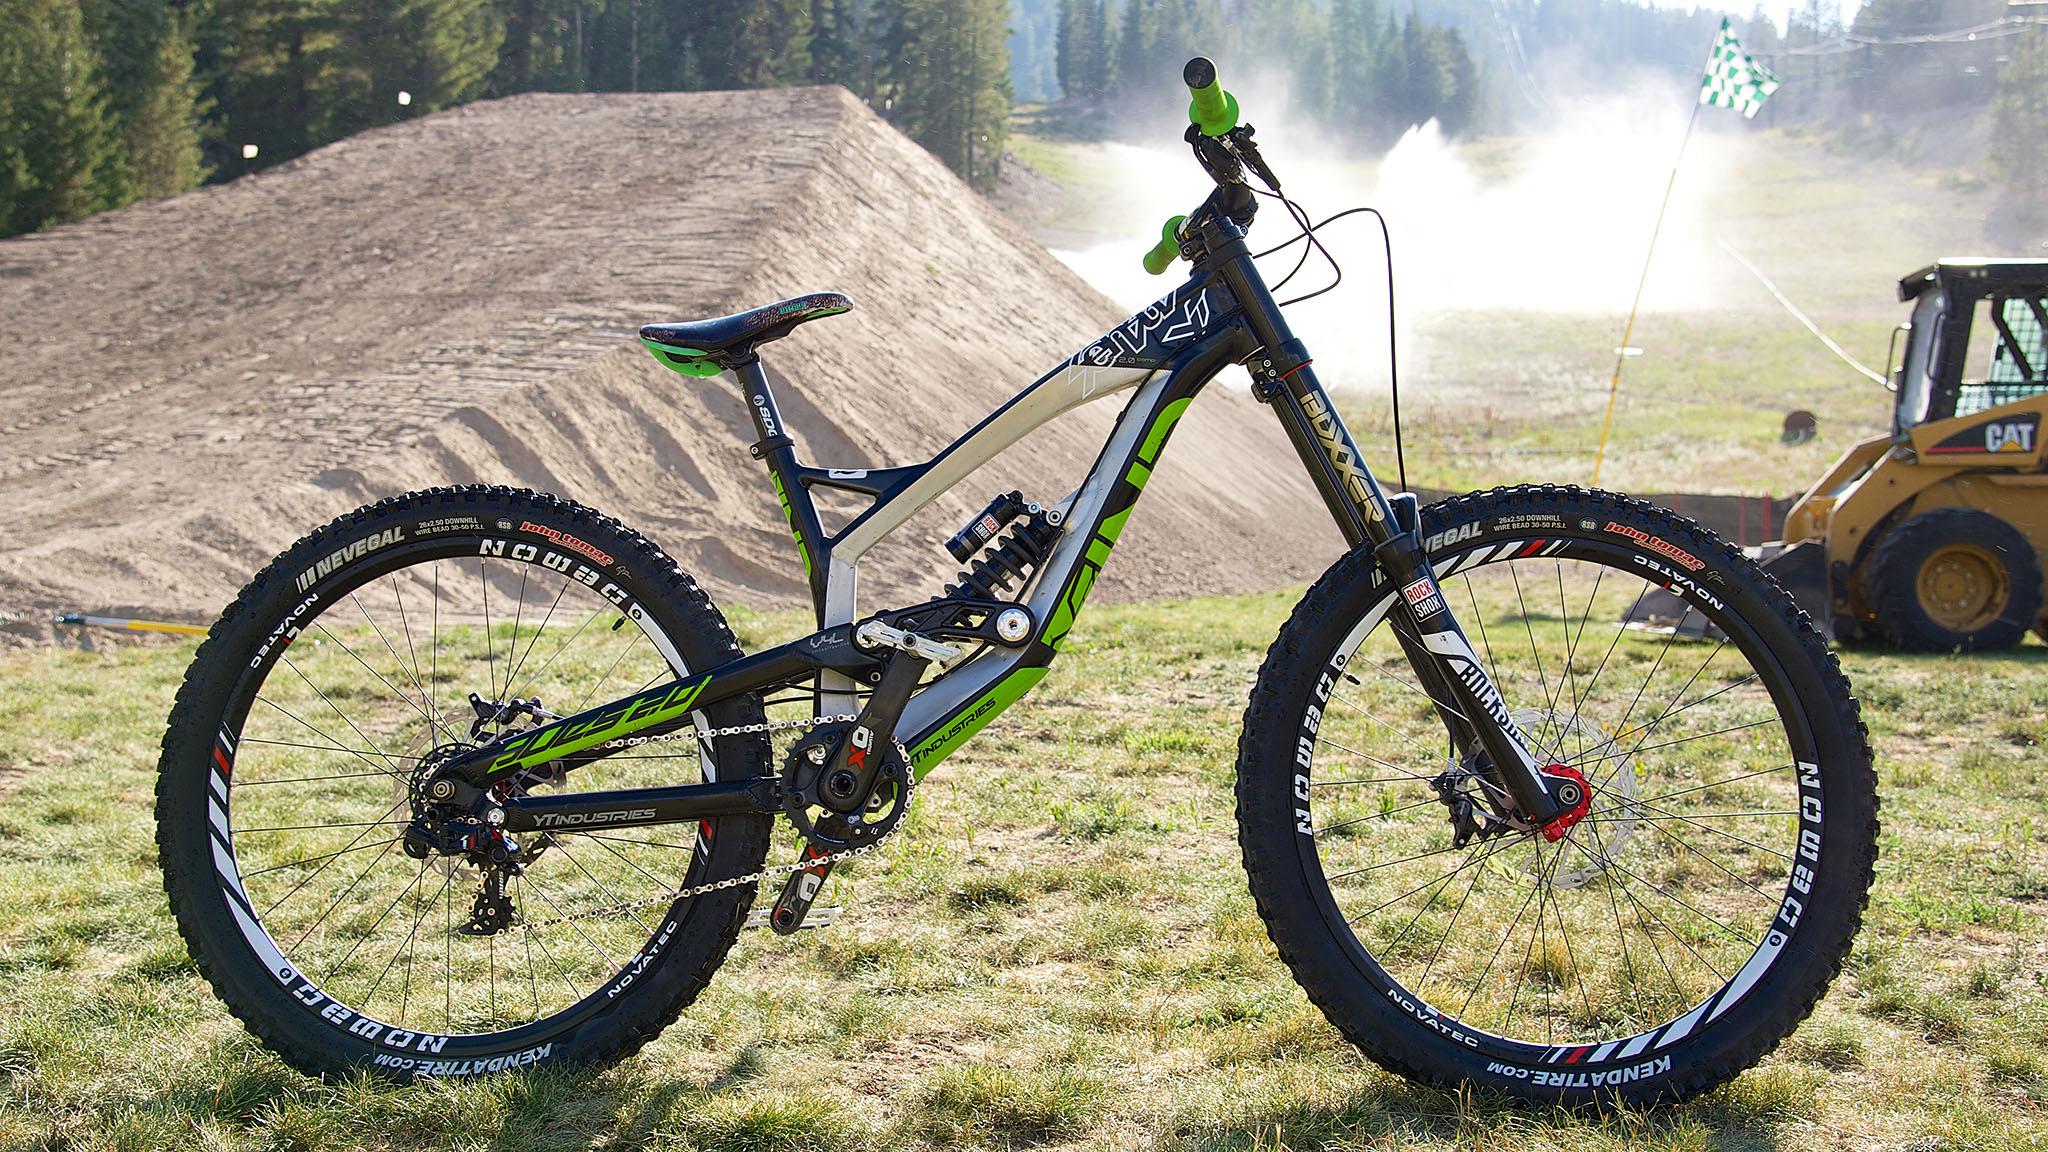 Cam Zink S Mammoth Backflip Bike Cam Zink S Mammoth Bike Build